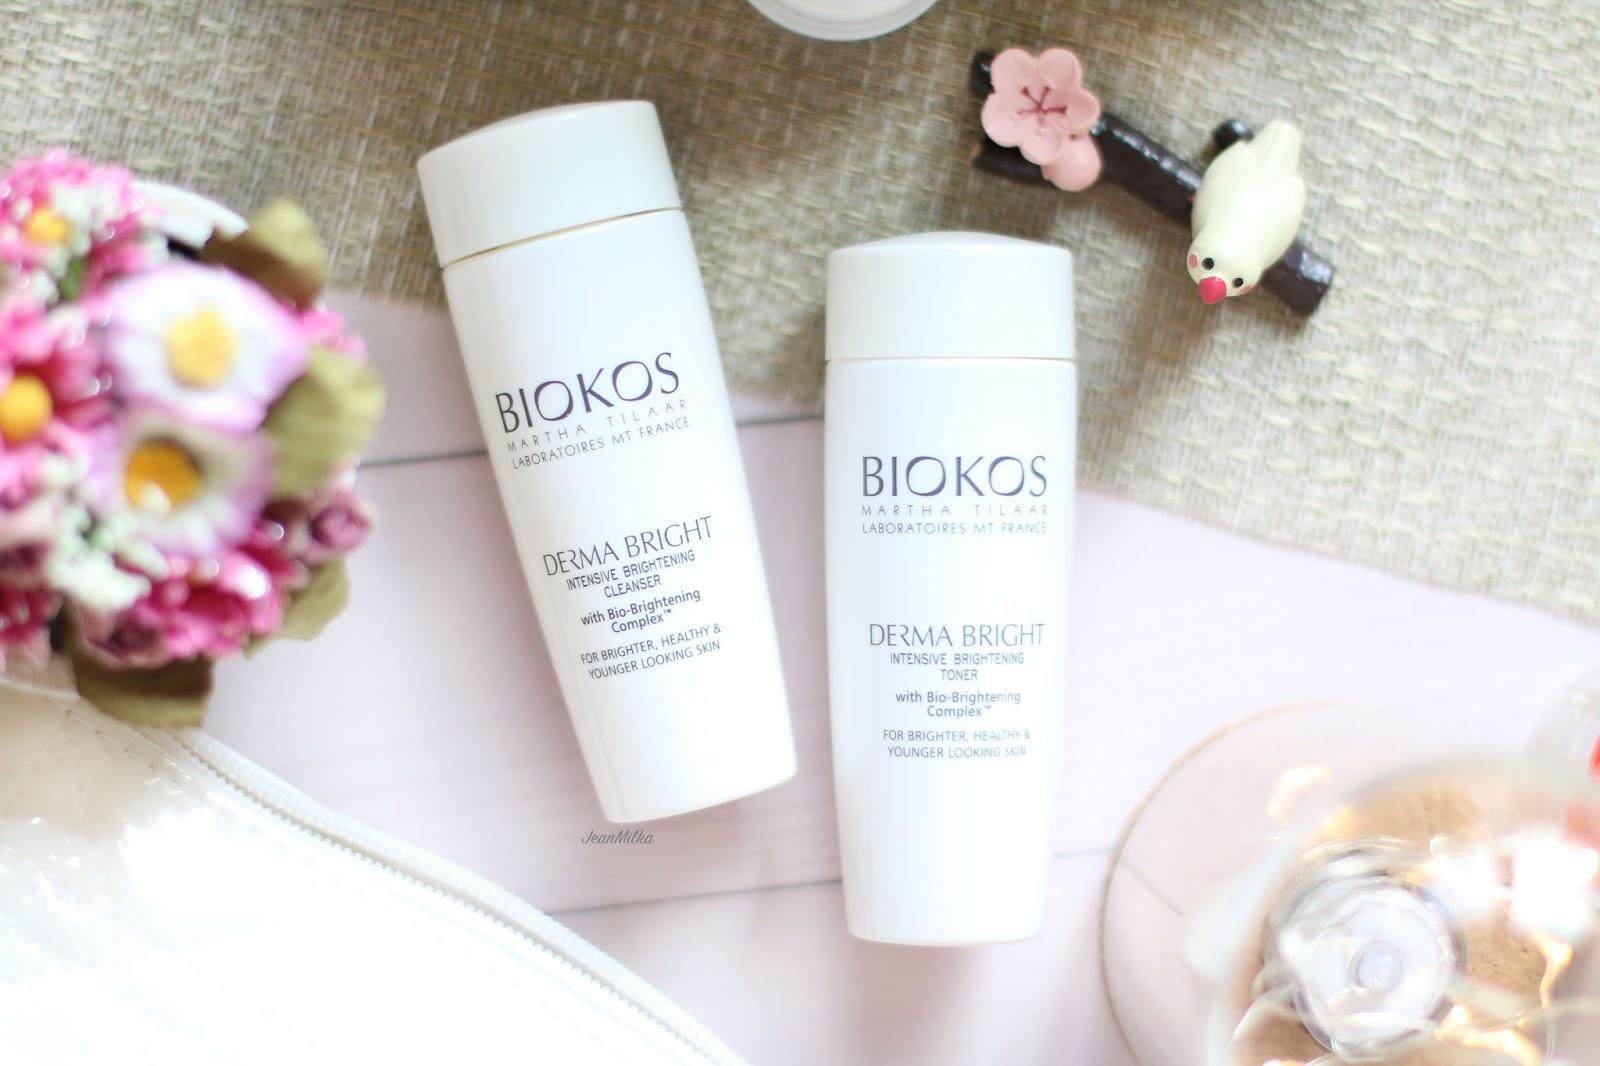 biokos, derma bright, biokos derma bright, skincare, skincare indonesia, skincare review, brightening skincare